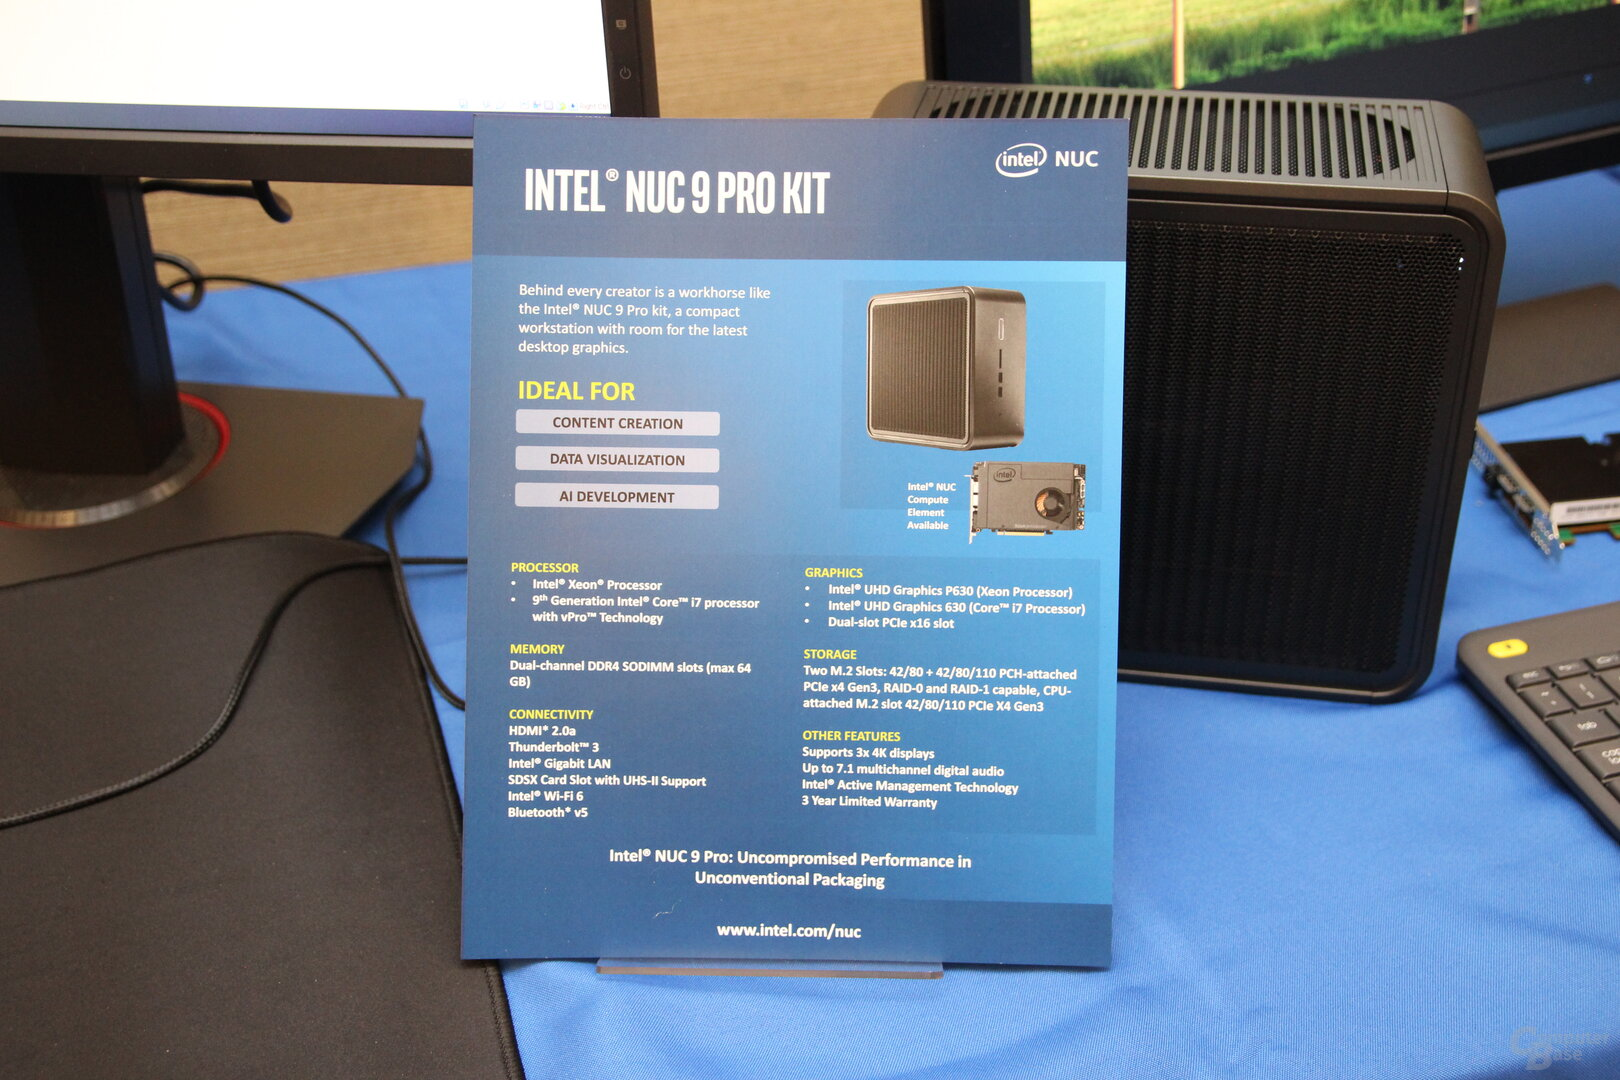 Intel NUC9